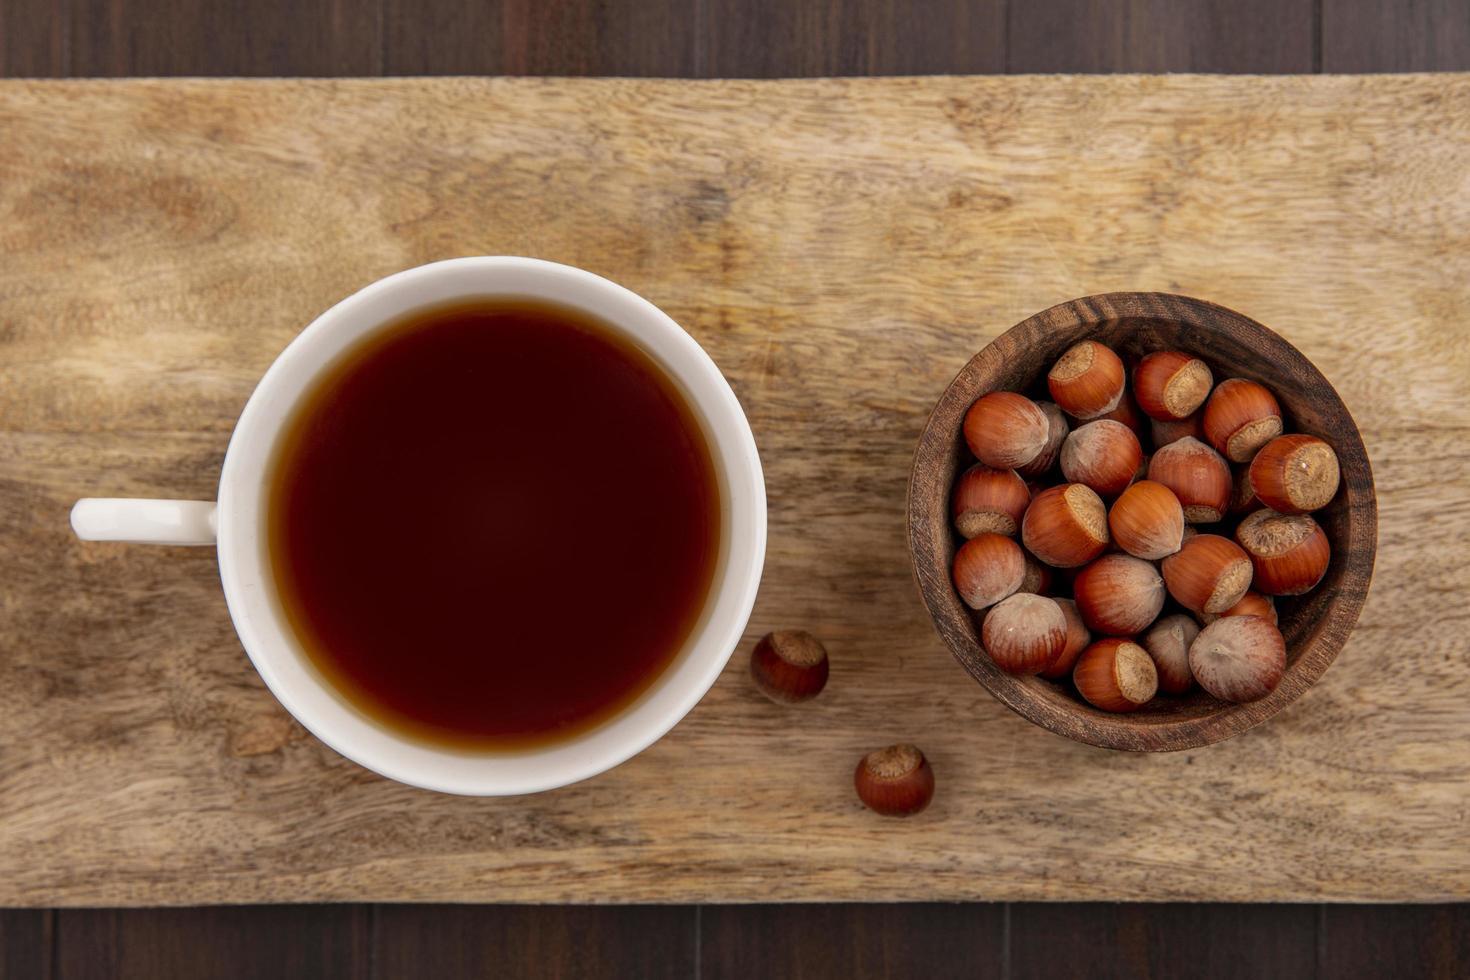 kopje thee met noten op houten snijplank foto